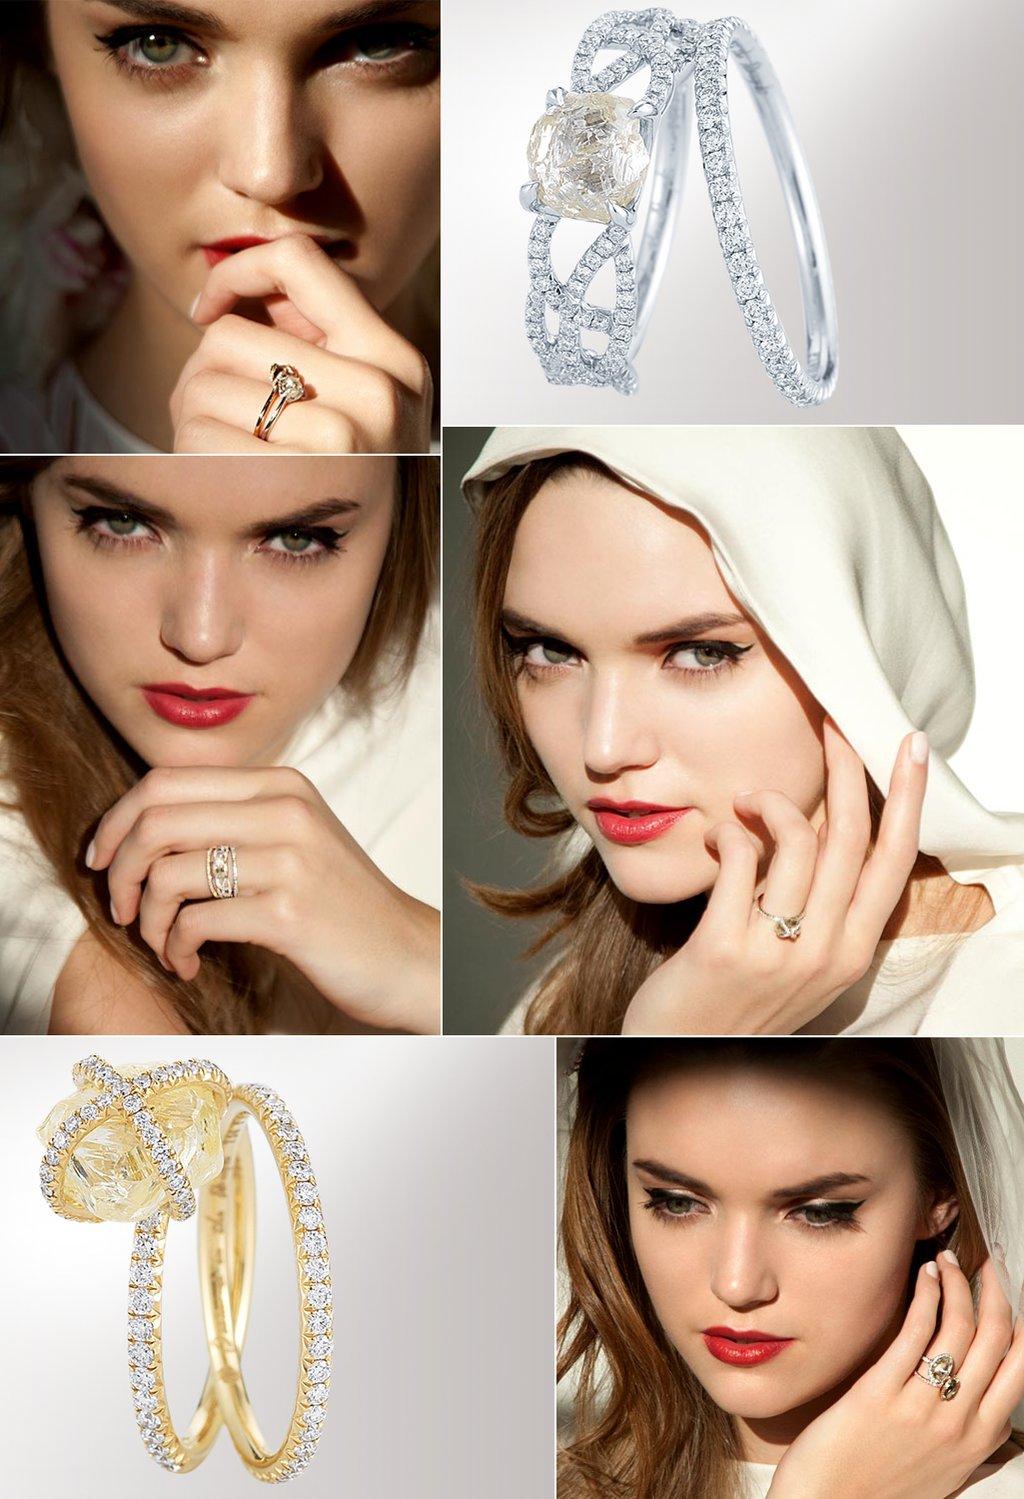 Ditr_unique-engagement-rings-2012-wedding-jewelry-trends-rough-cut-diamonds.full